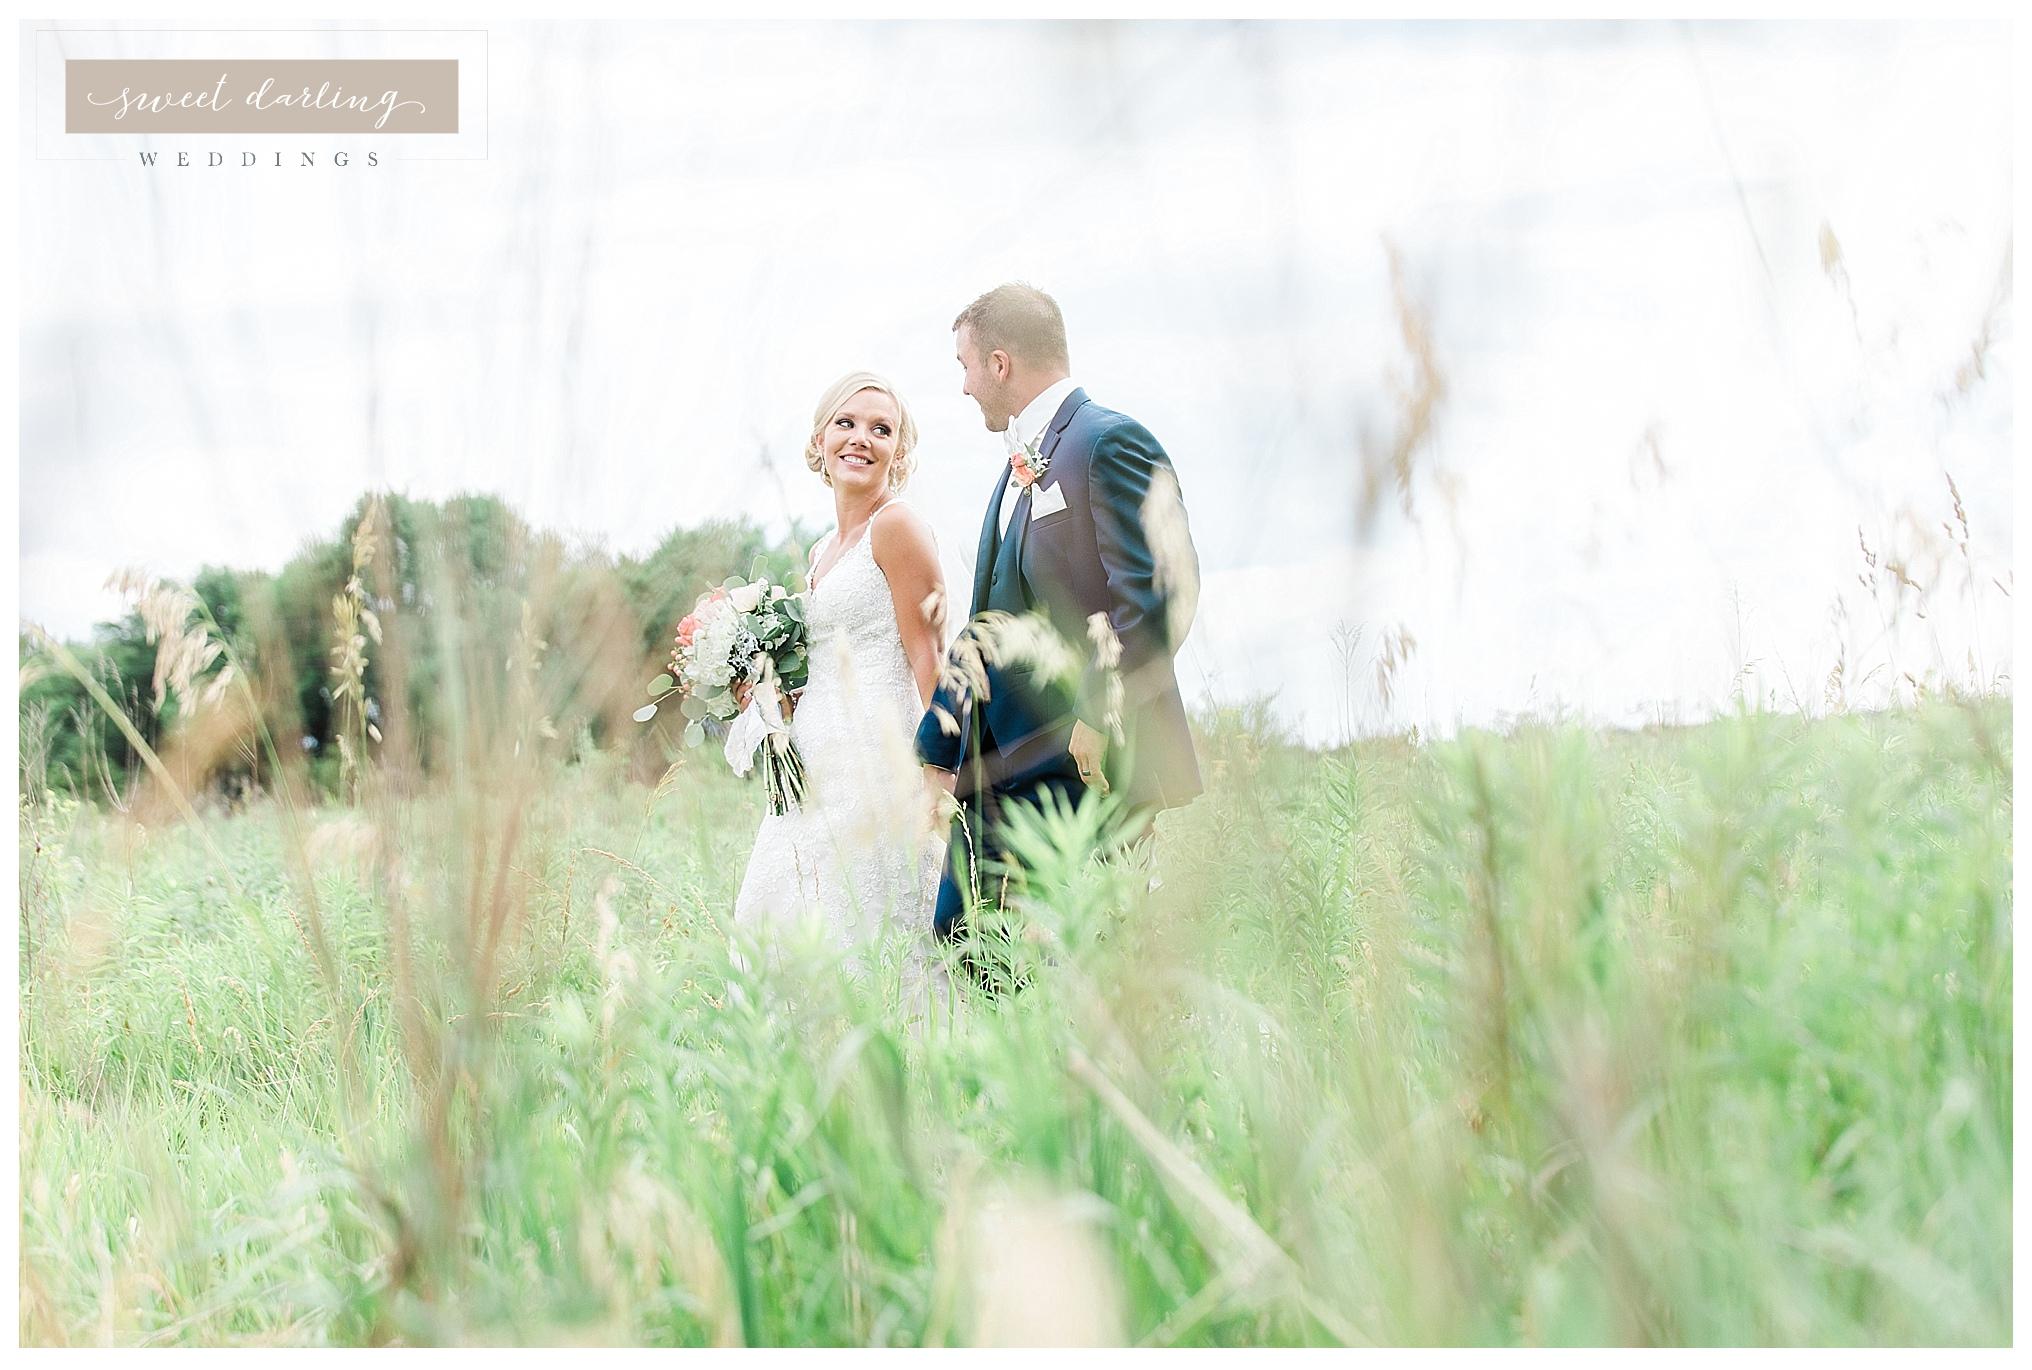 Paxton-illinois-engelbrecht-farmstead-romantic-wedding-photographer-sweet-darling-weddings_1225.jpg